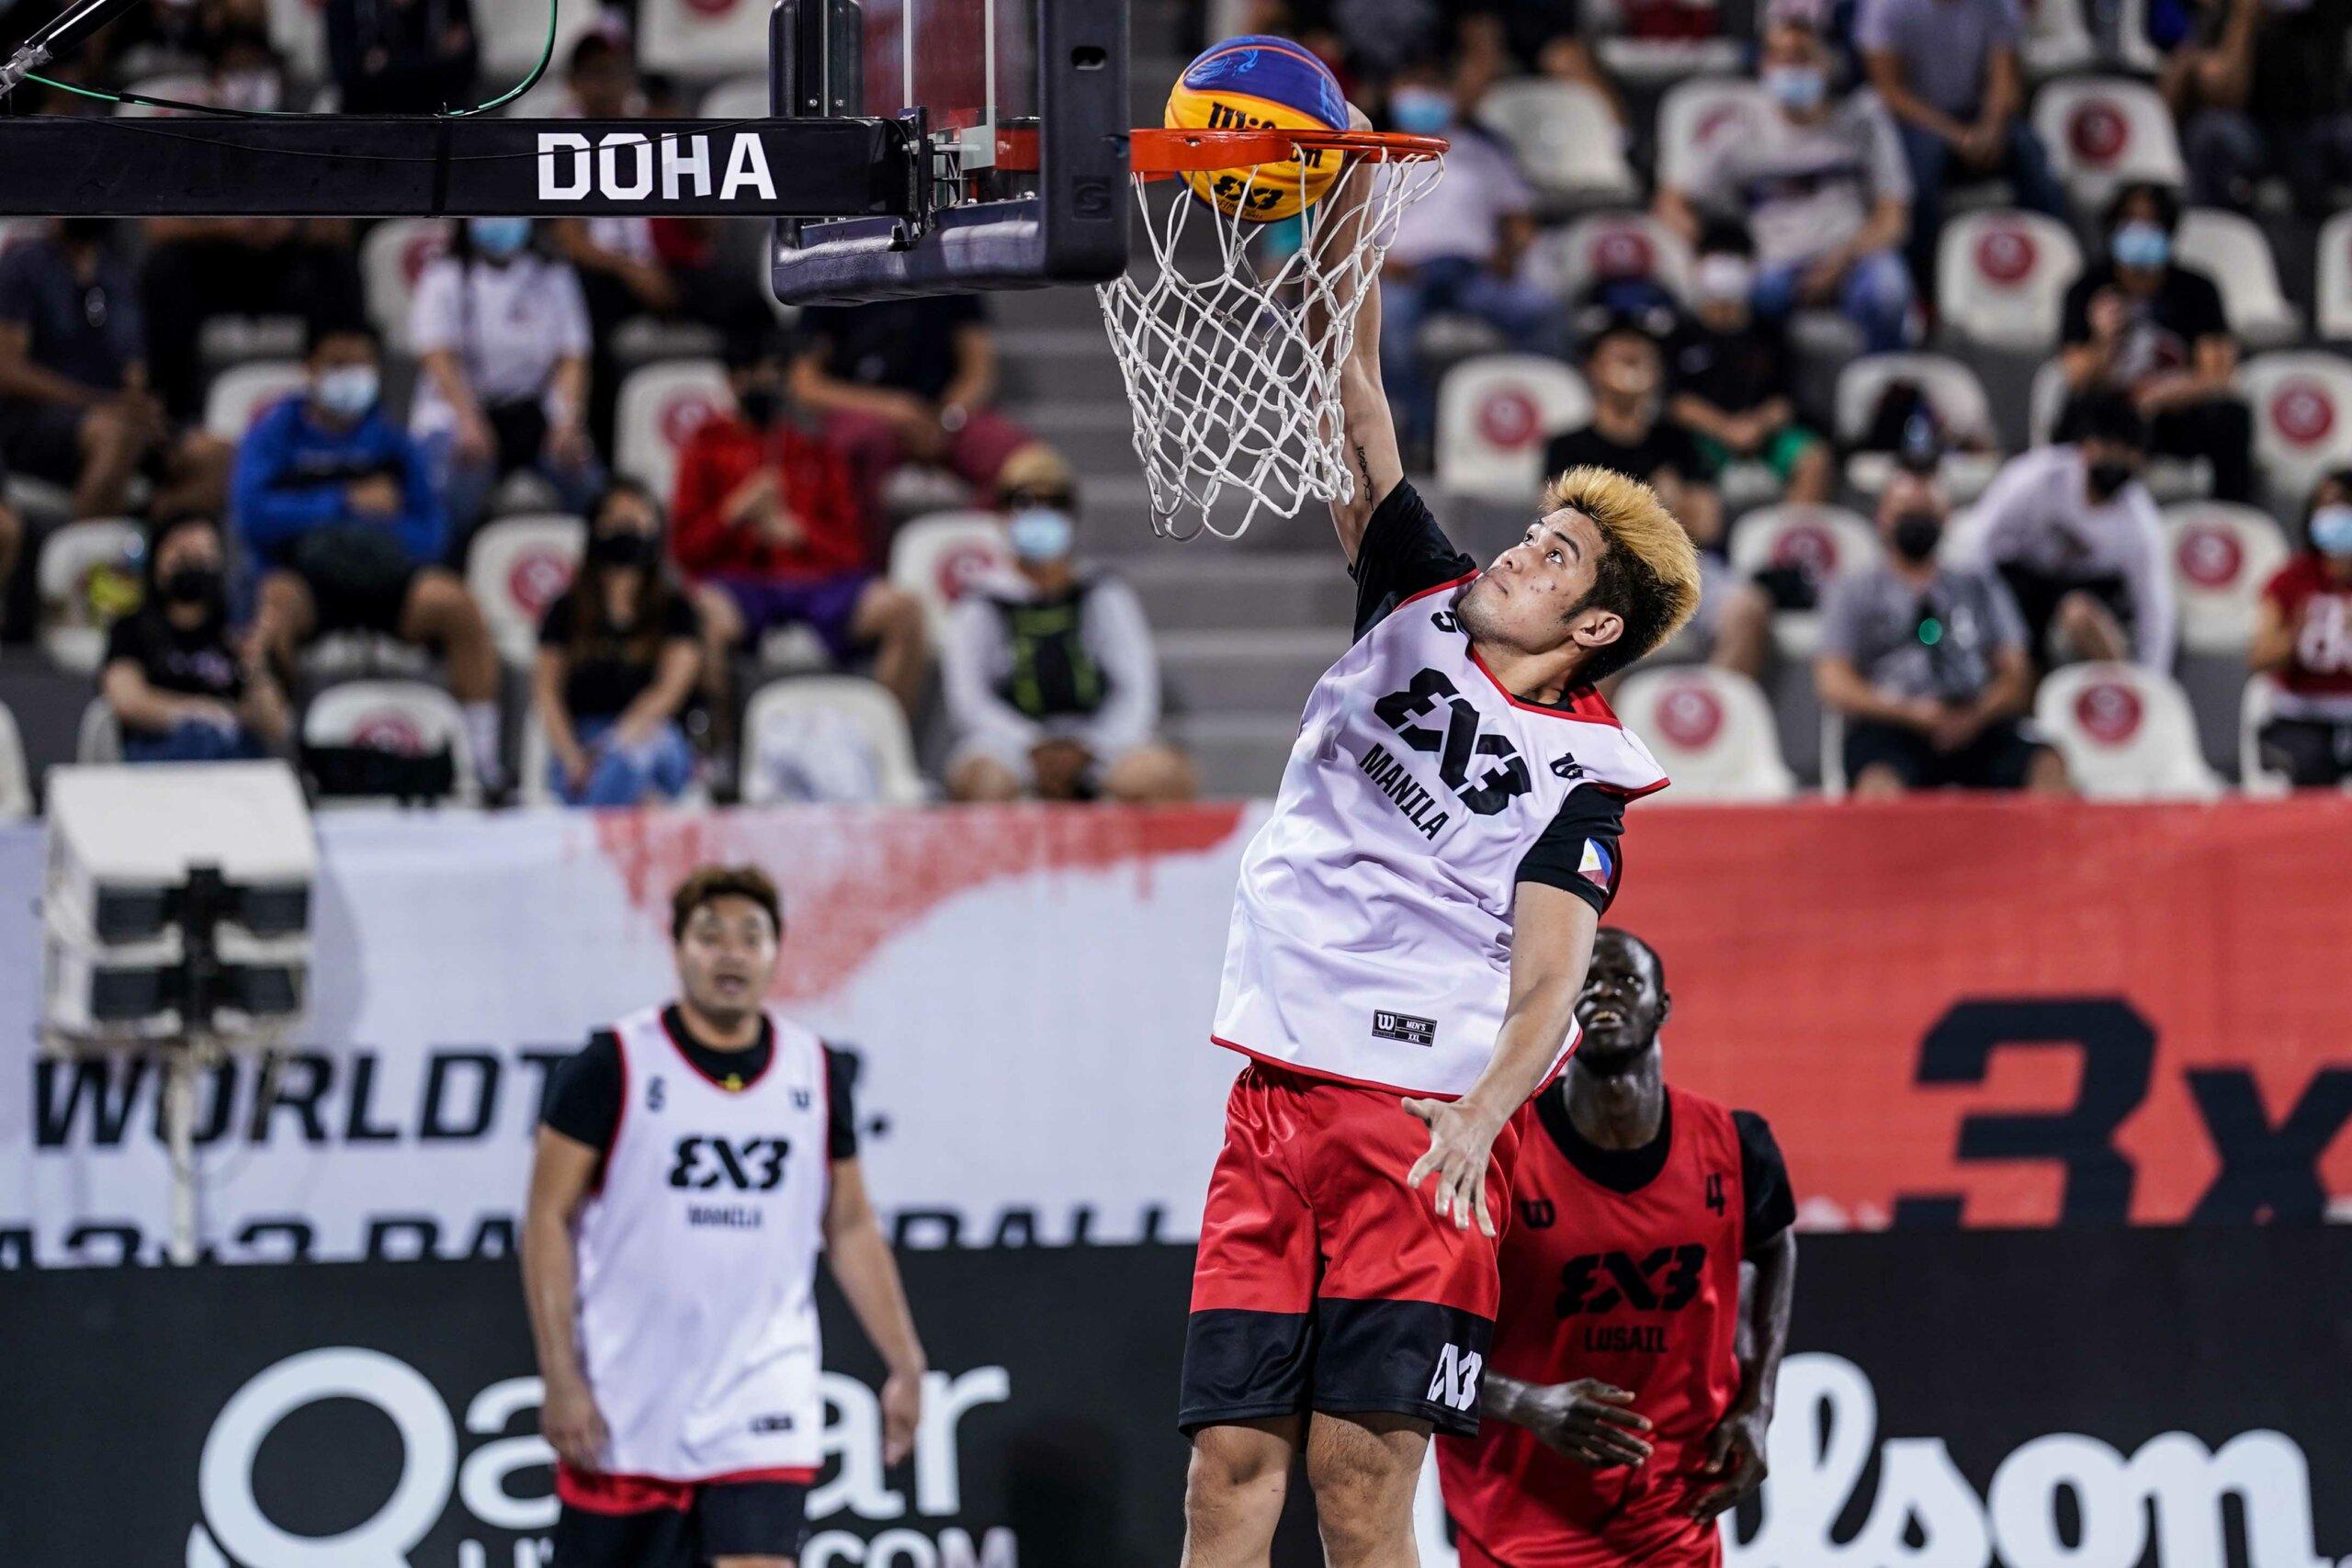 2020-FIBA-3X3-DOHA-WT-Manila-Chooks-TM-vs-Lusail-Santillan-scaled Dehesa, Santillan to push Gilas 3x3 to the limit in Calambubble 2020 Tokyo Olympics 3x3 Basketball Gilas Pilipinas News  - philippine sports news